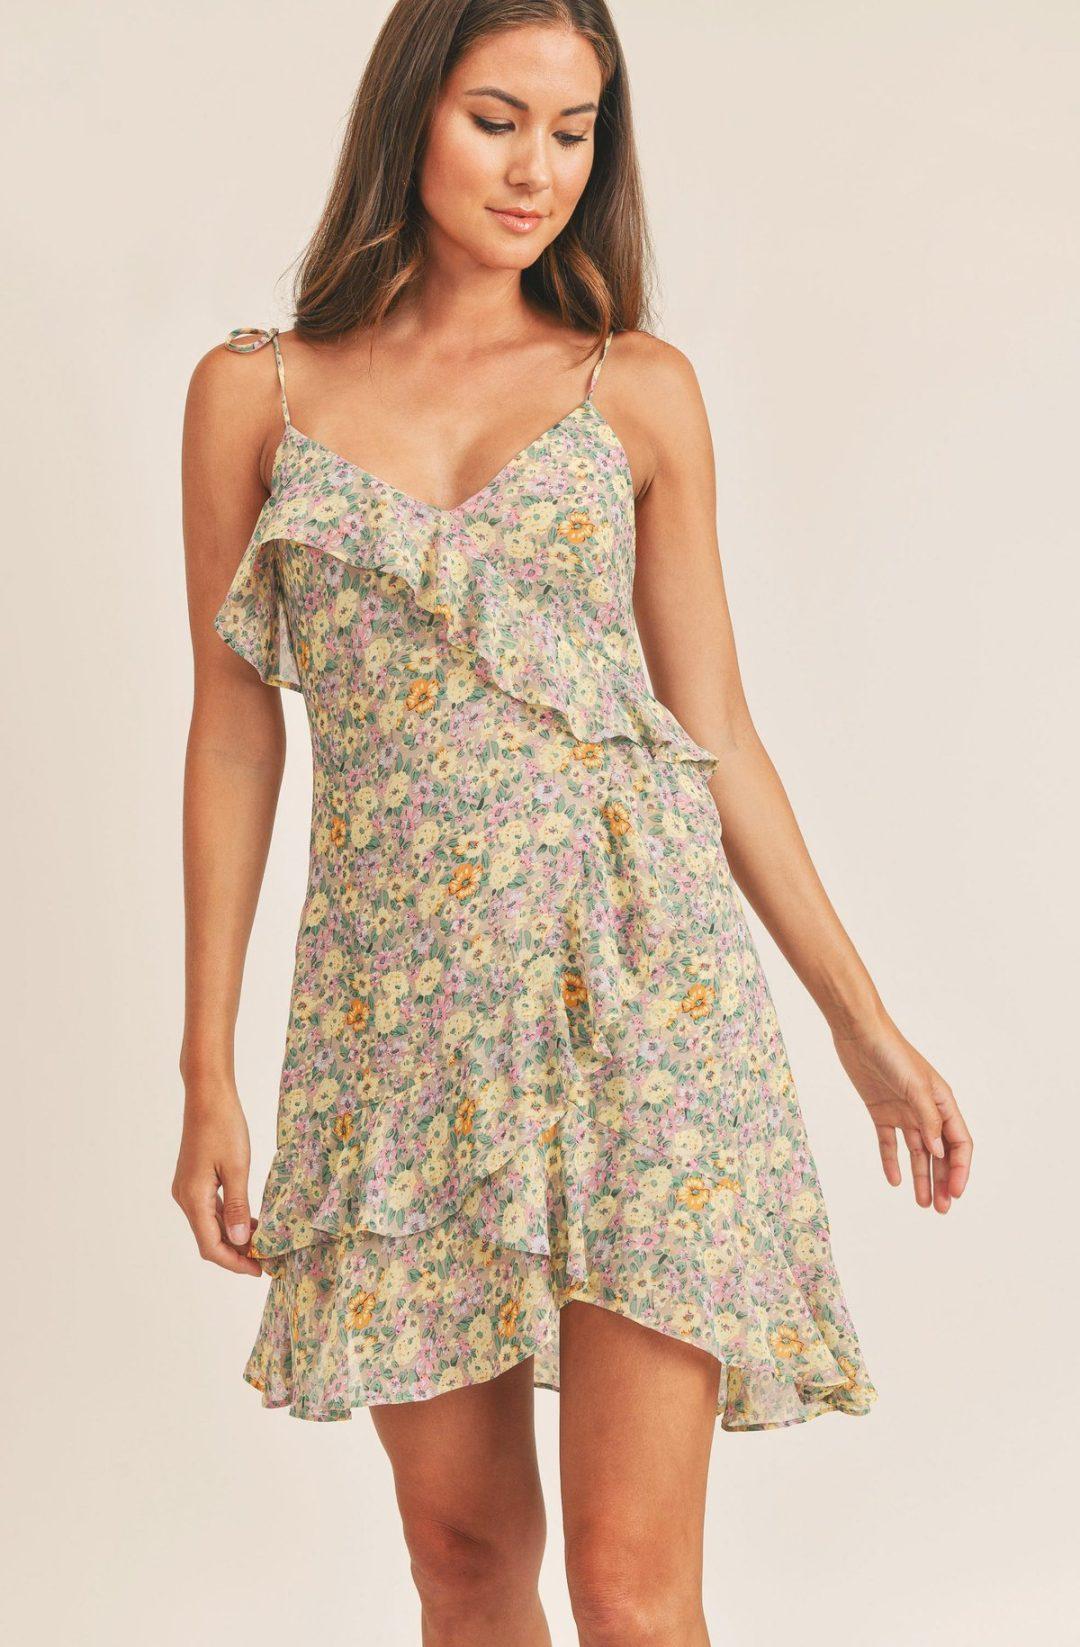 Dainty ruffled floral mini dress